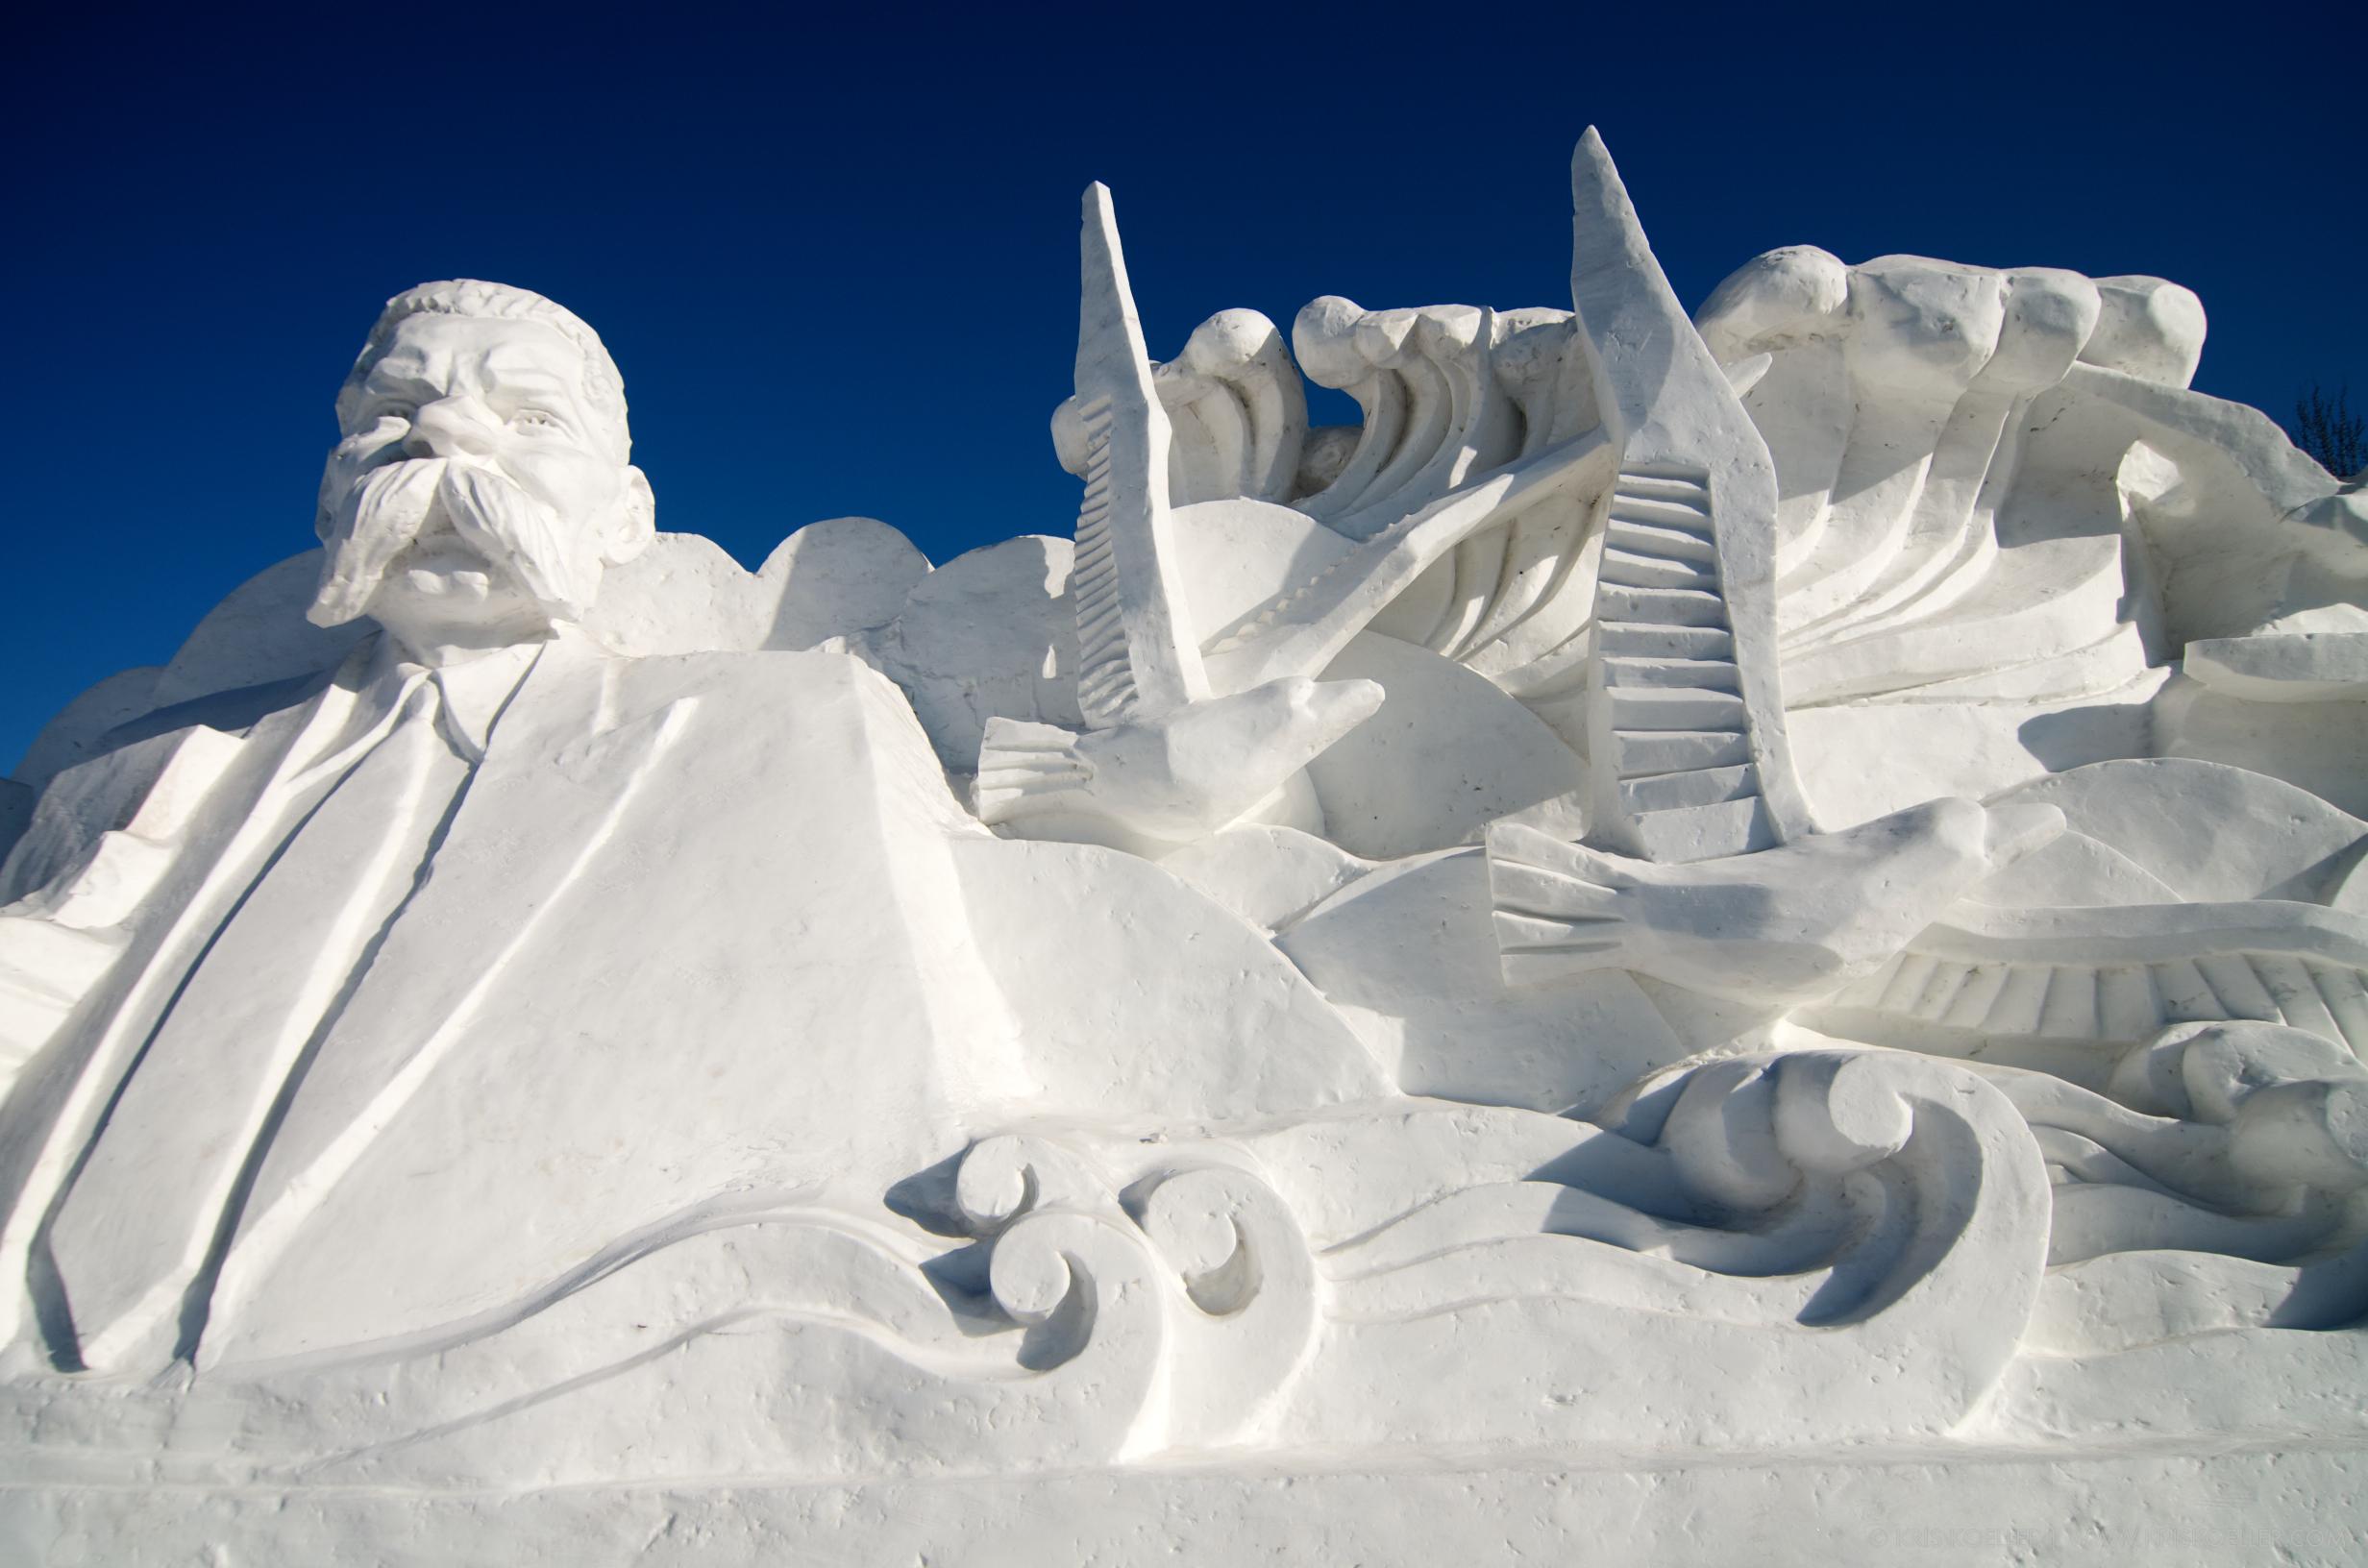 The Harbin, China Snow & Ice Festival